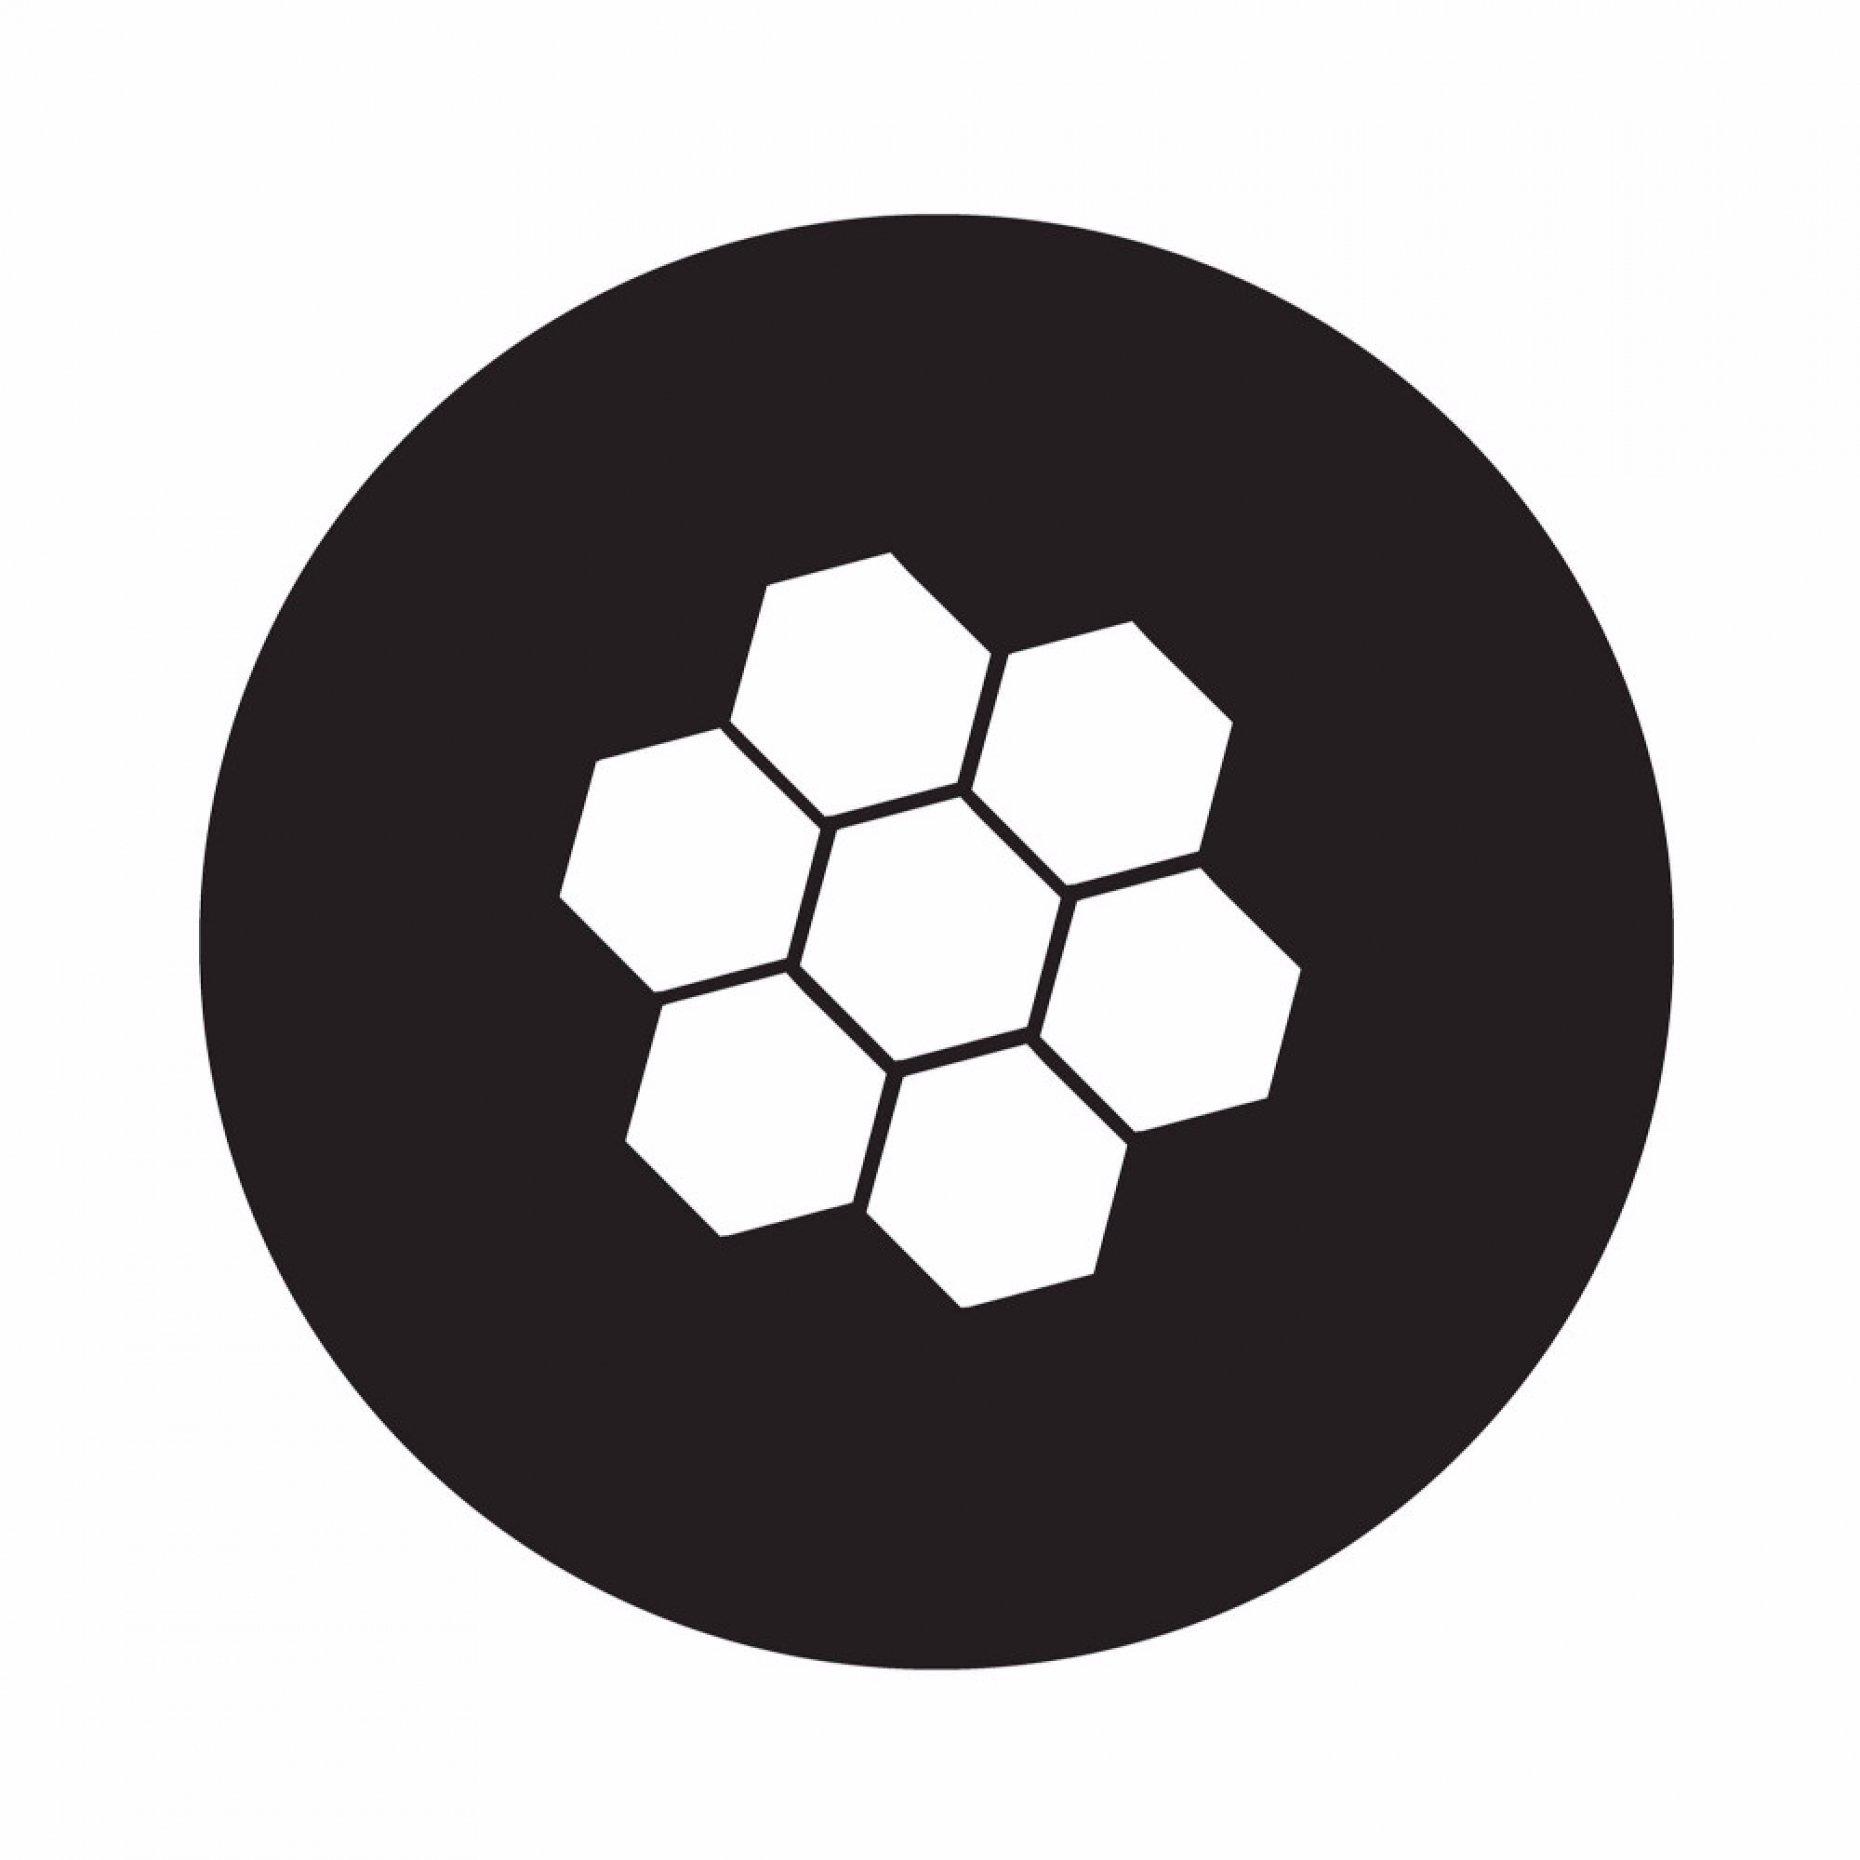 7 Hexagon Holes Grid